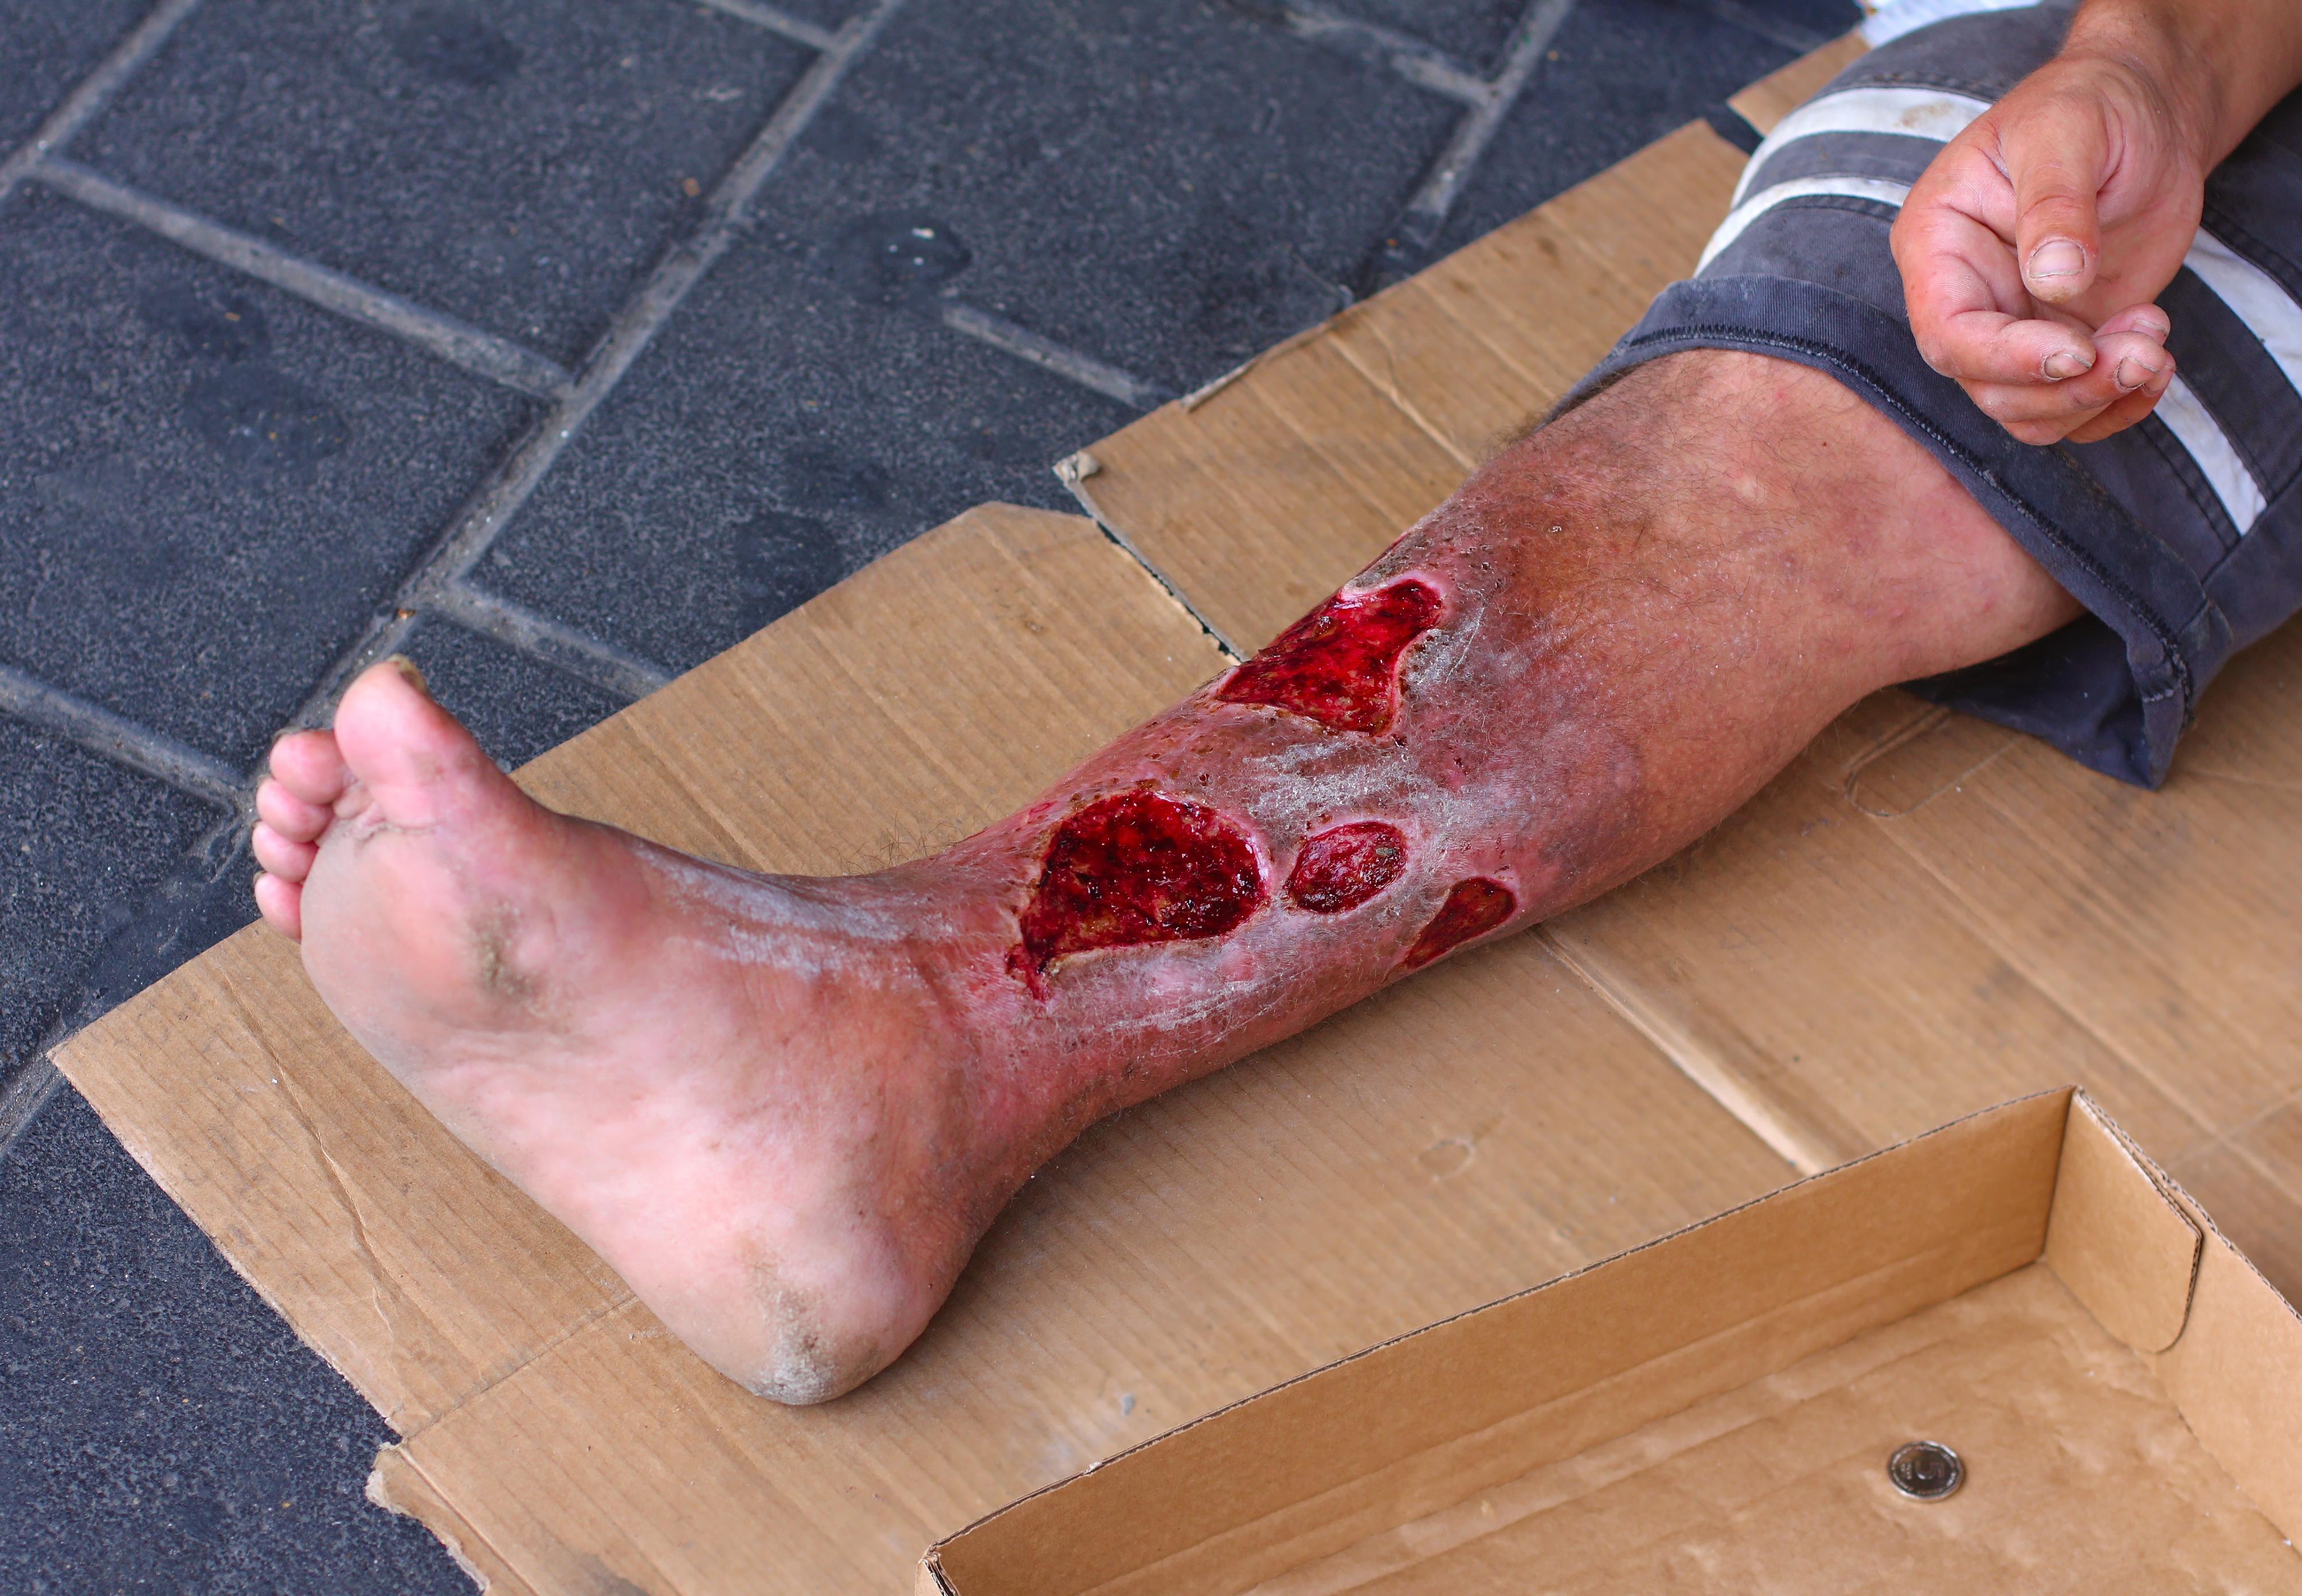 infekterat sår behandling